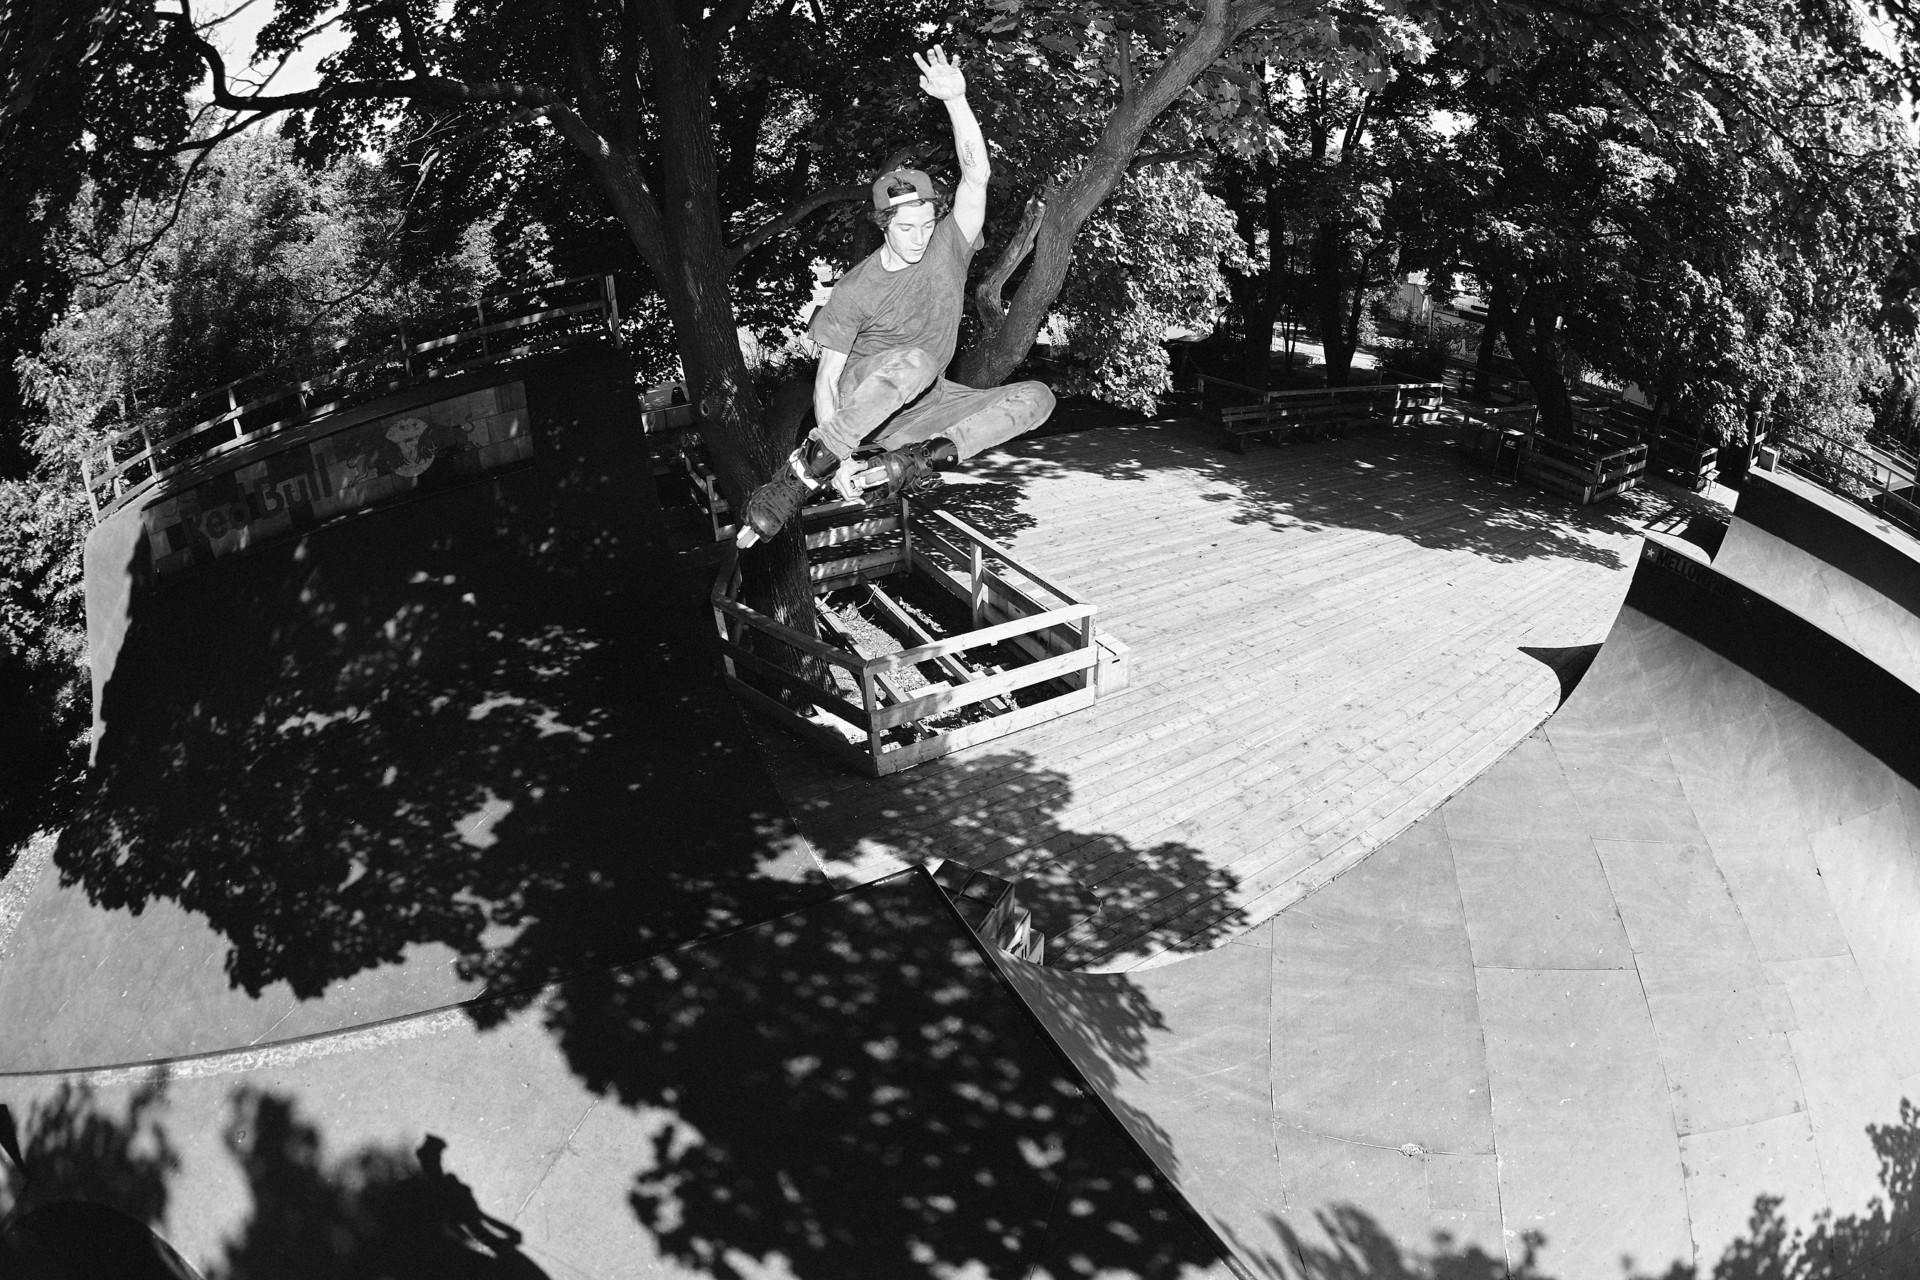 Felix Strosetzki - Photography Rollerblading